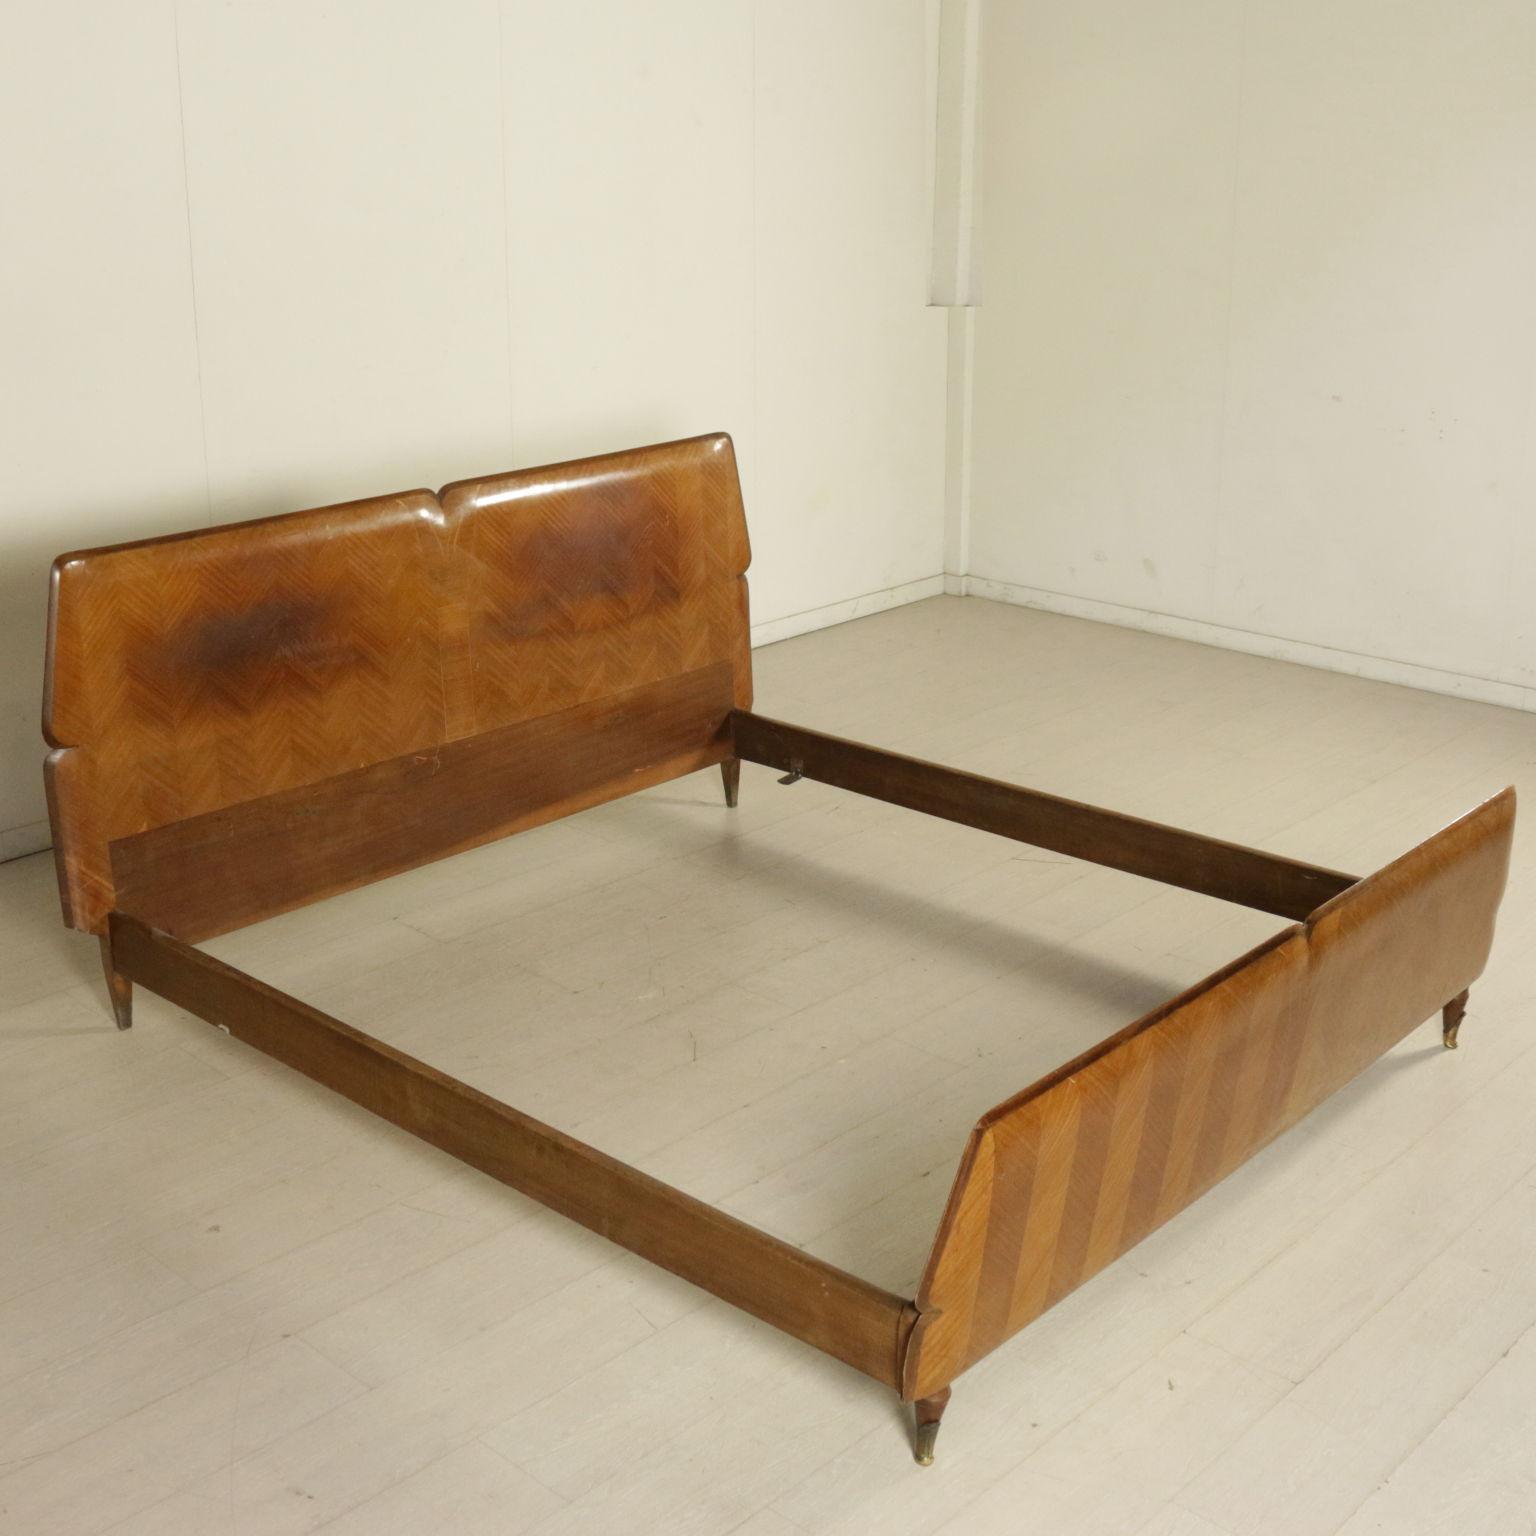 Matrimonio Bed : Matrimonial bed mmahogany veneer wood vintage manufactured